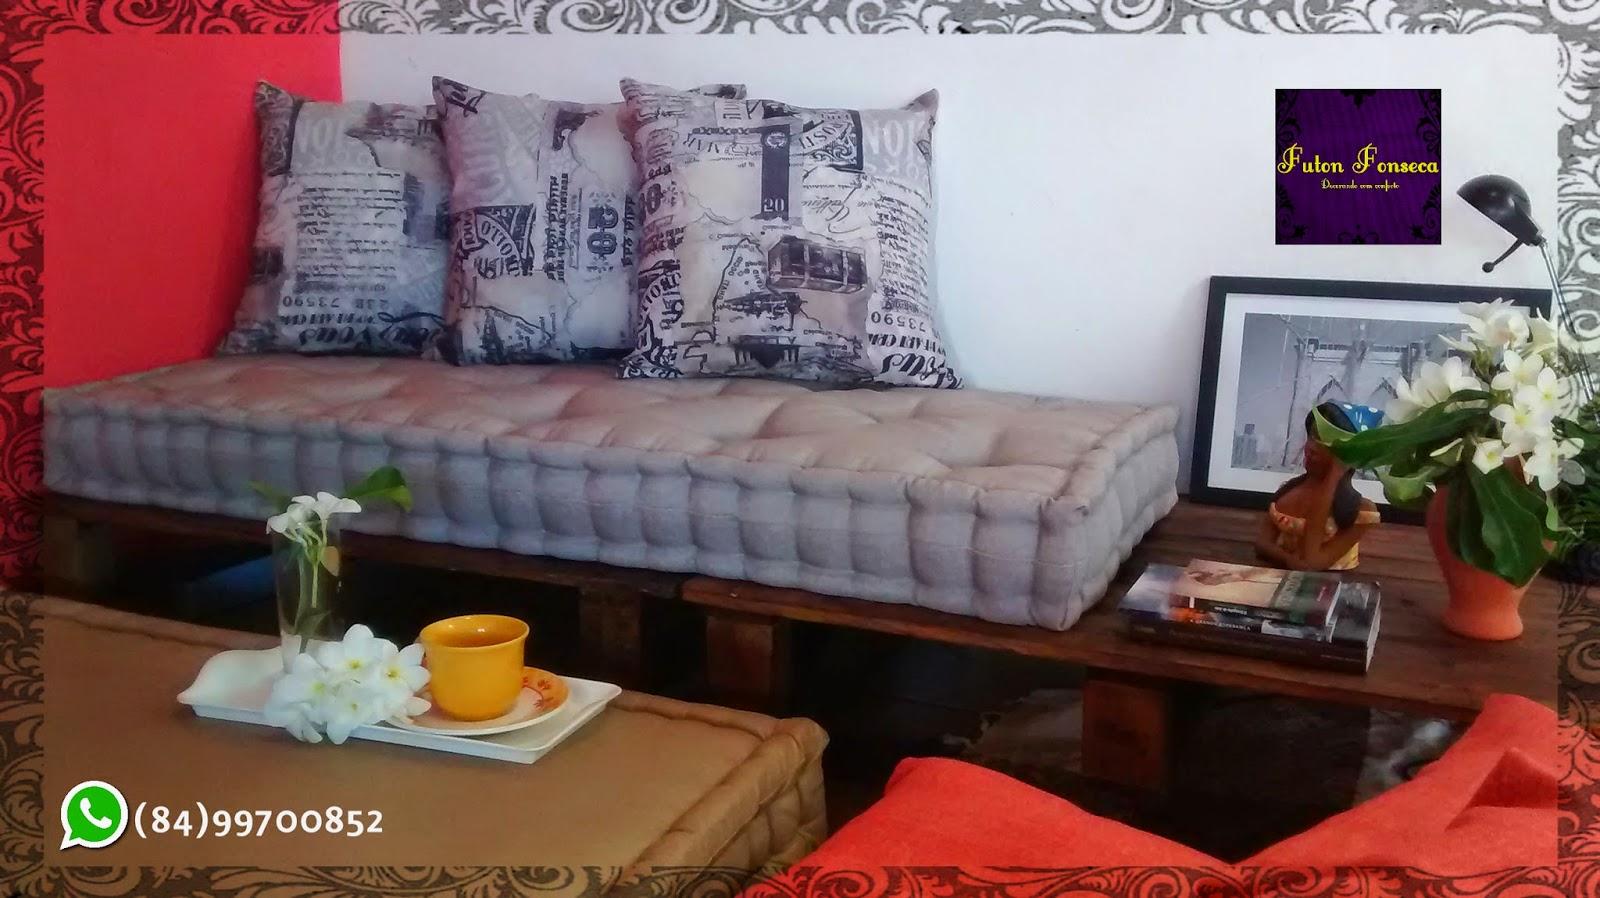 Sofa E Colchao Osasco Tufted Grey Futon Fonseca